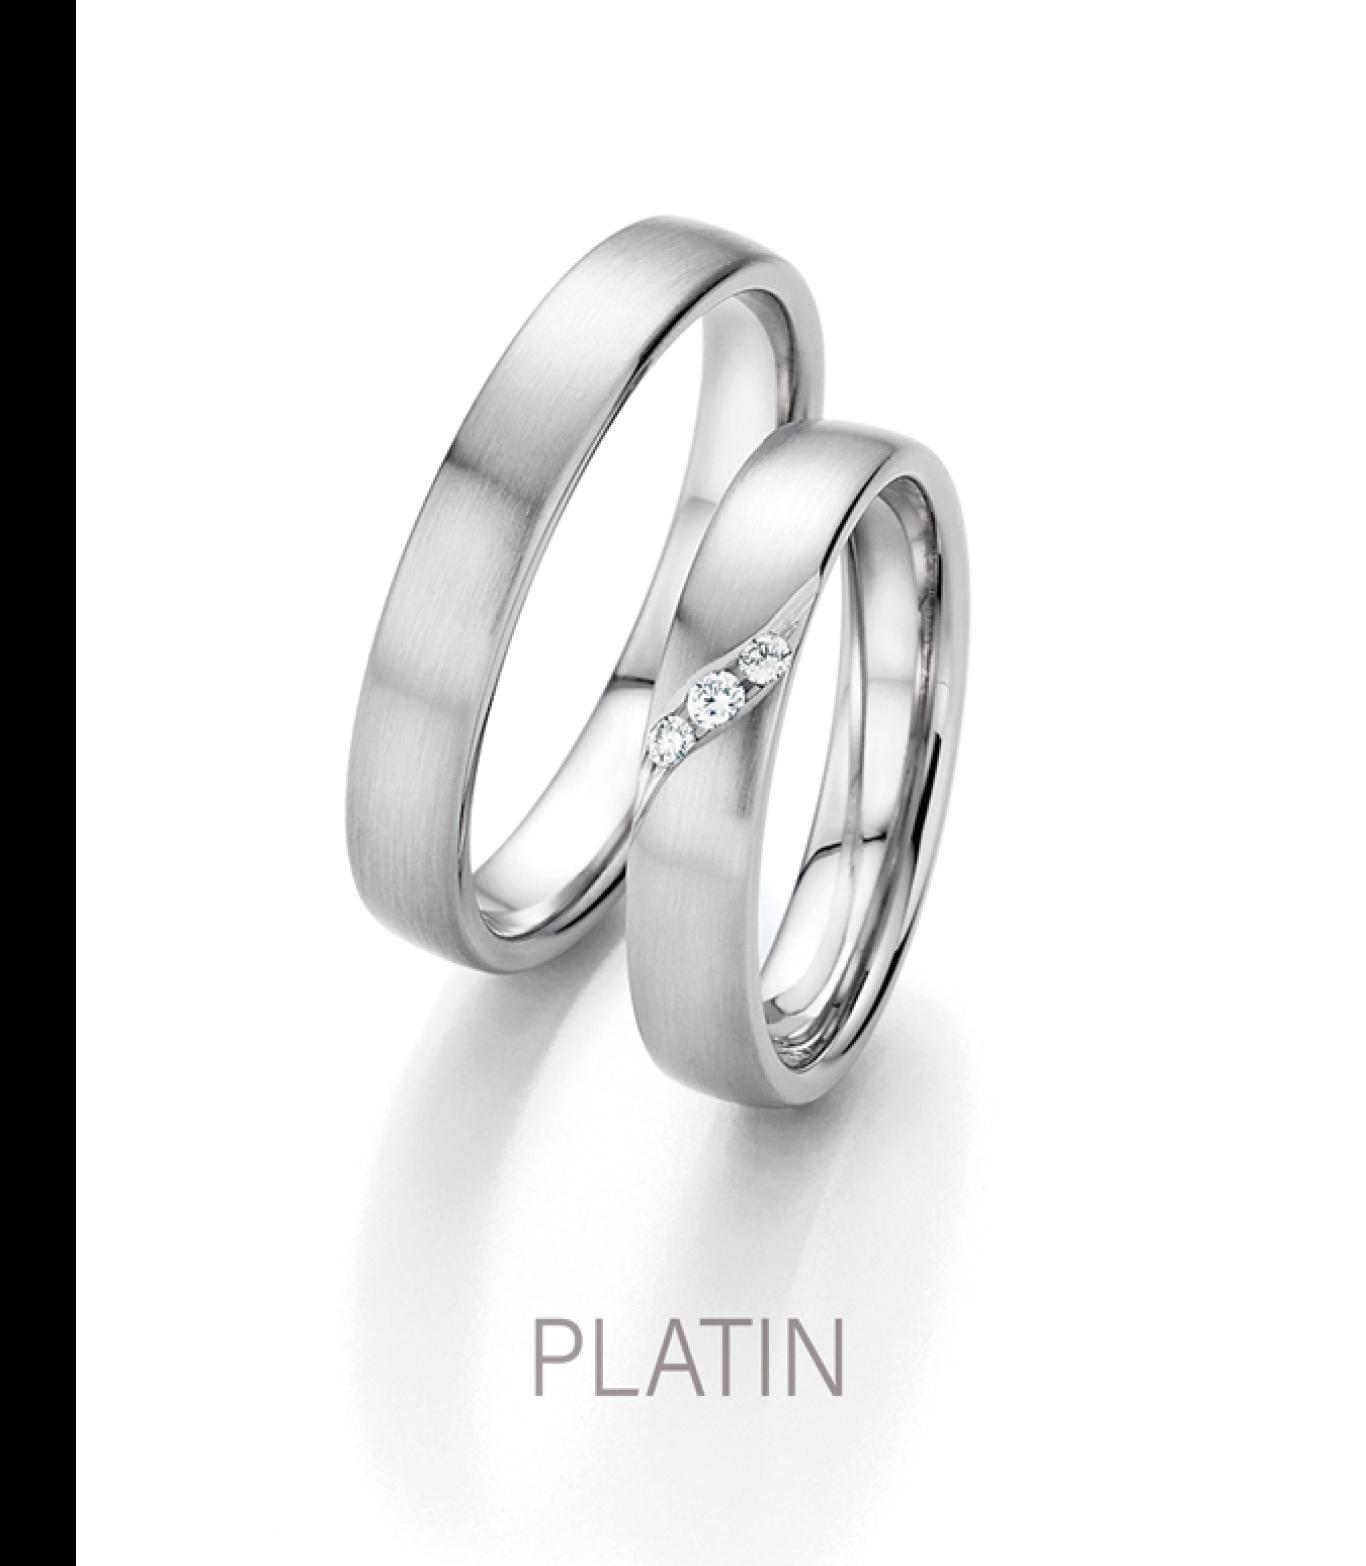 1_Platin_New